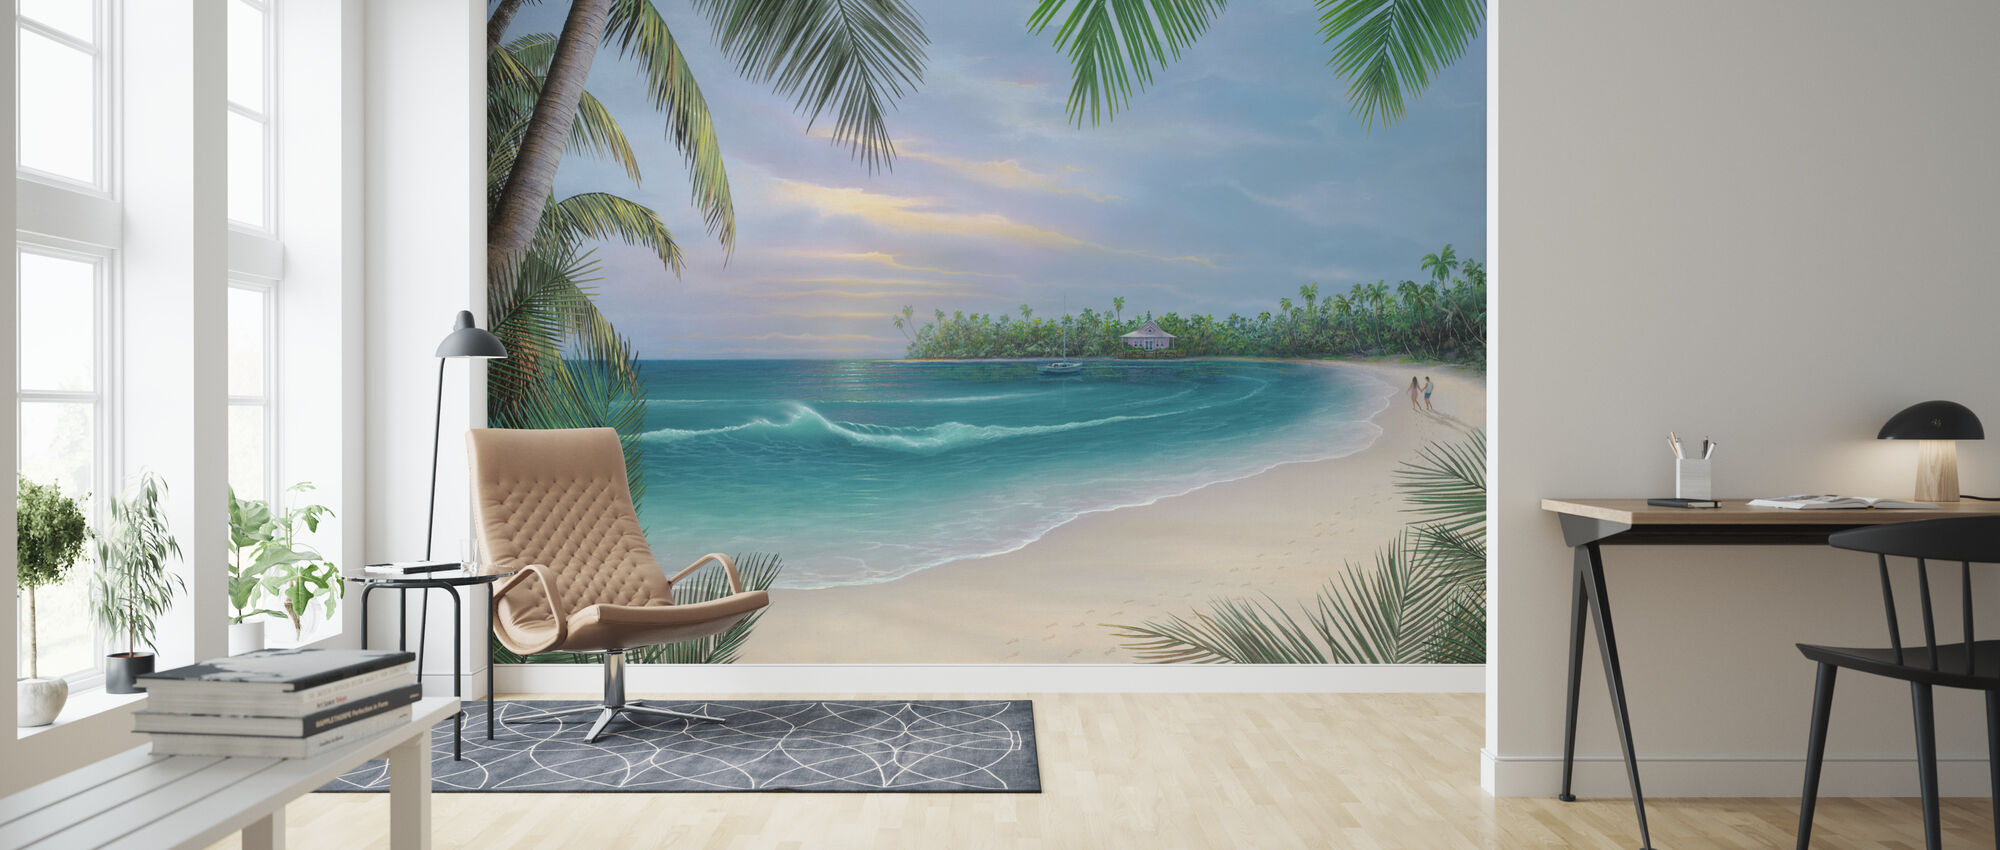 Beach House Rendezvous - Behang - Woonkamer